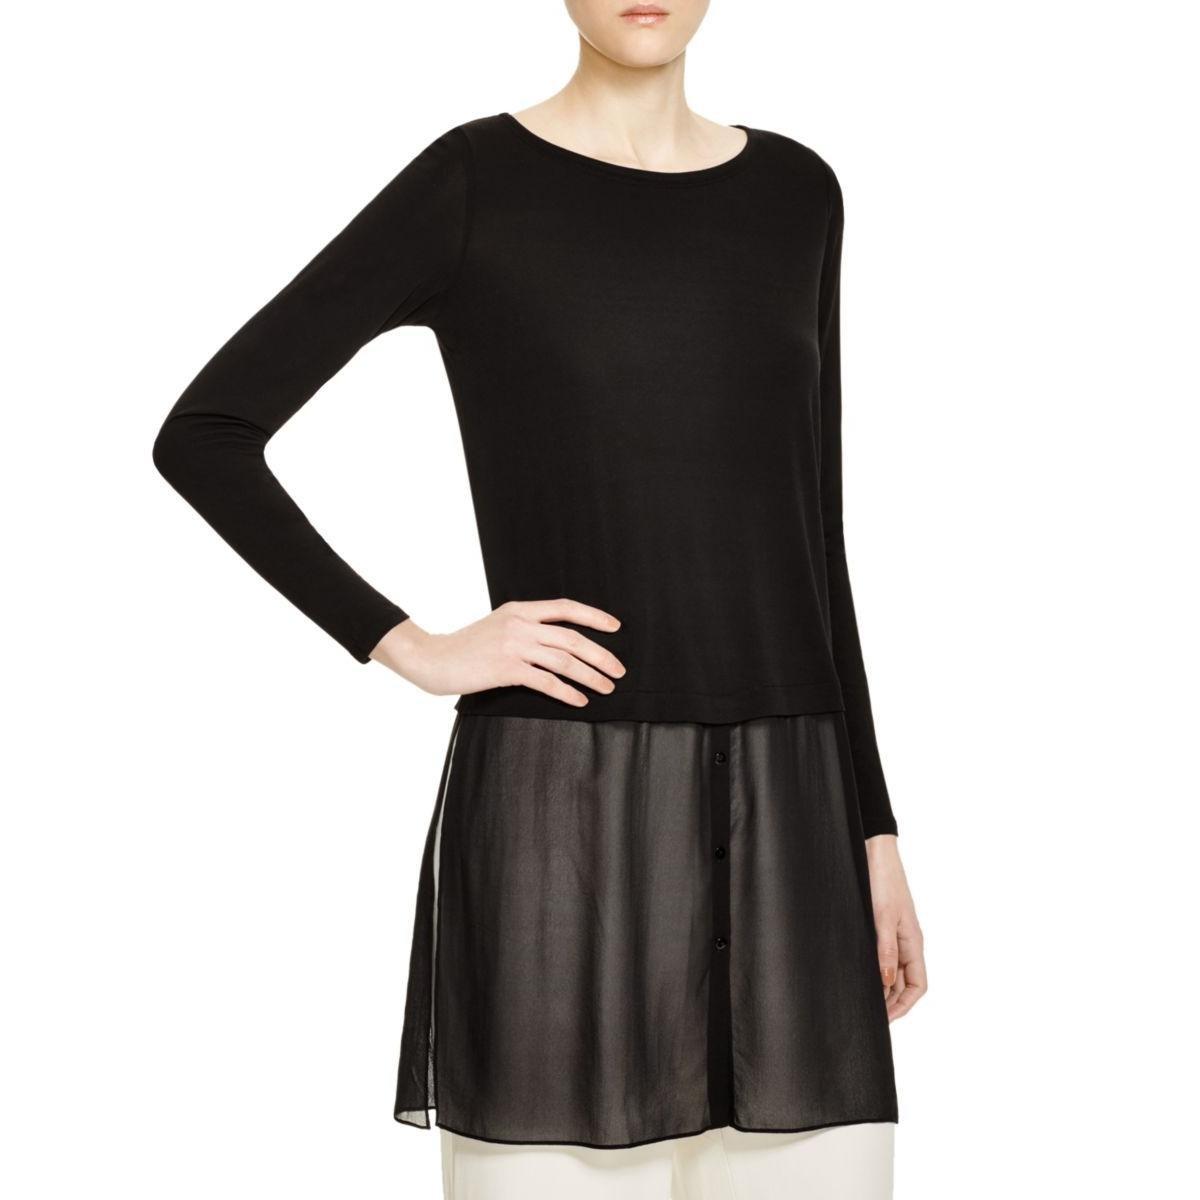 Eileen Fisher Womens Chiffon Hem Bateau Neck Pullover Top Black S